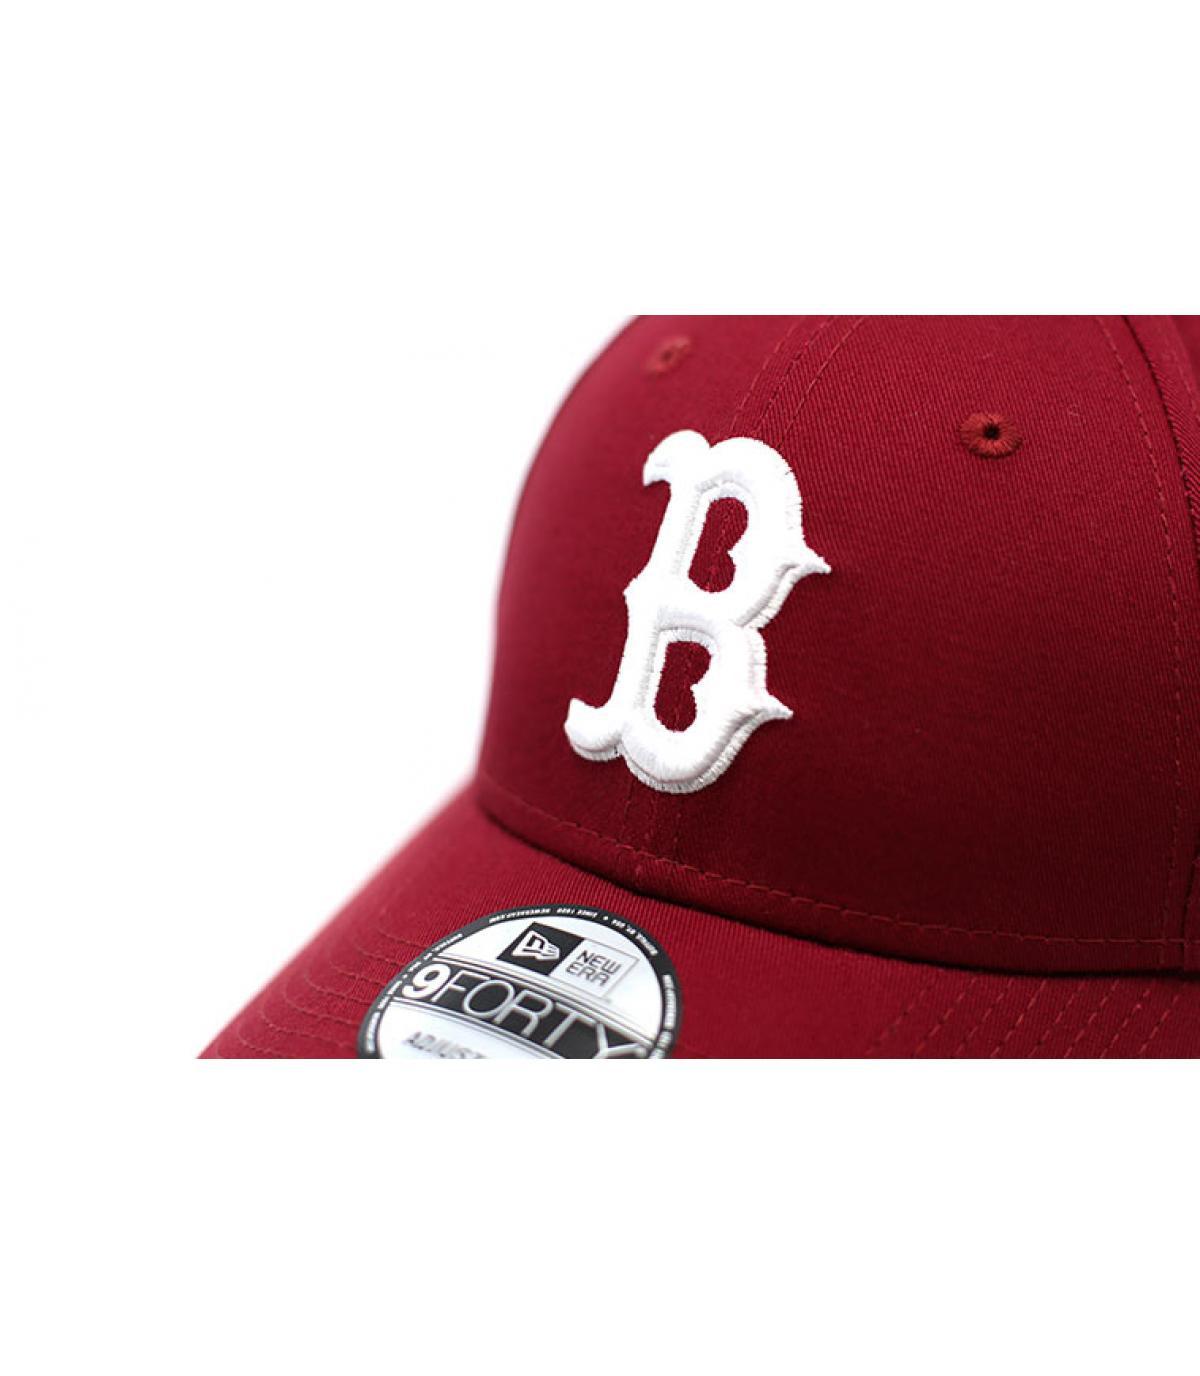 Dettagli League Ess 9Forty Boston cardinal - image 3